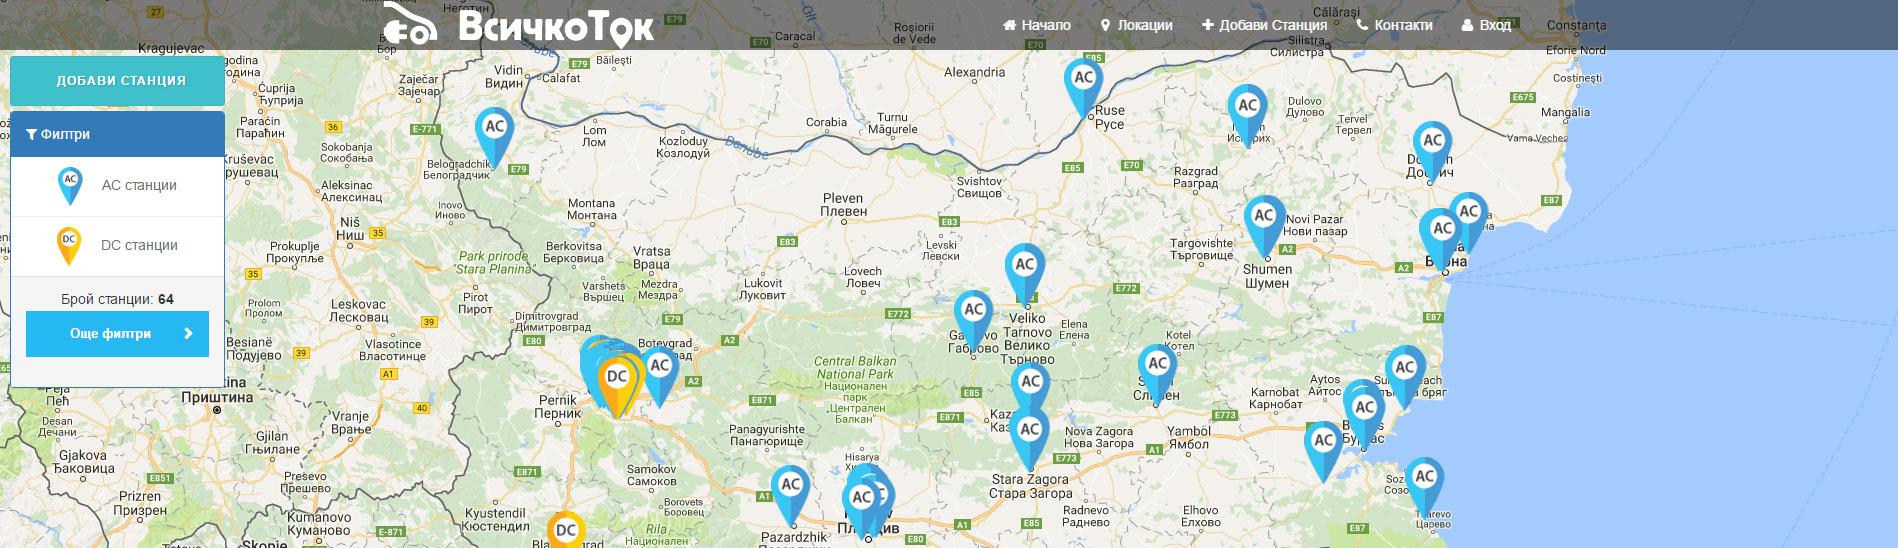 Навигационно приложение за зарядни станции ВсичкоТок.бг - Vsichkotok.bg